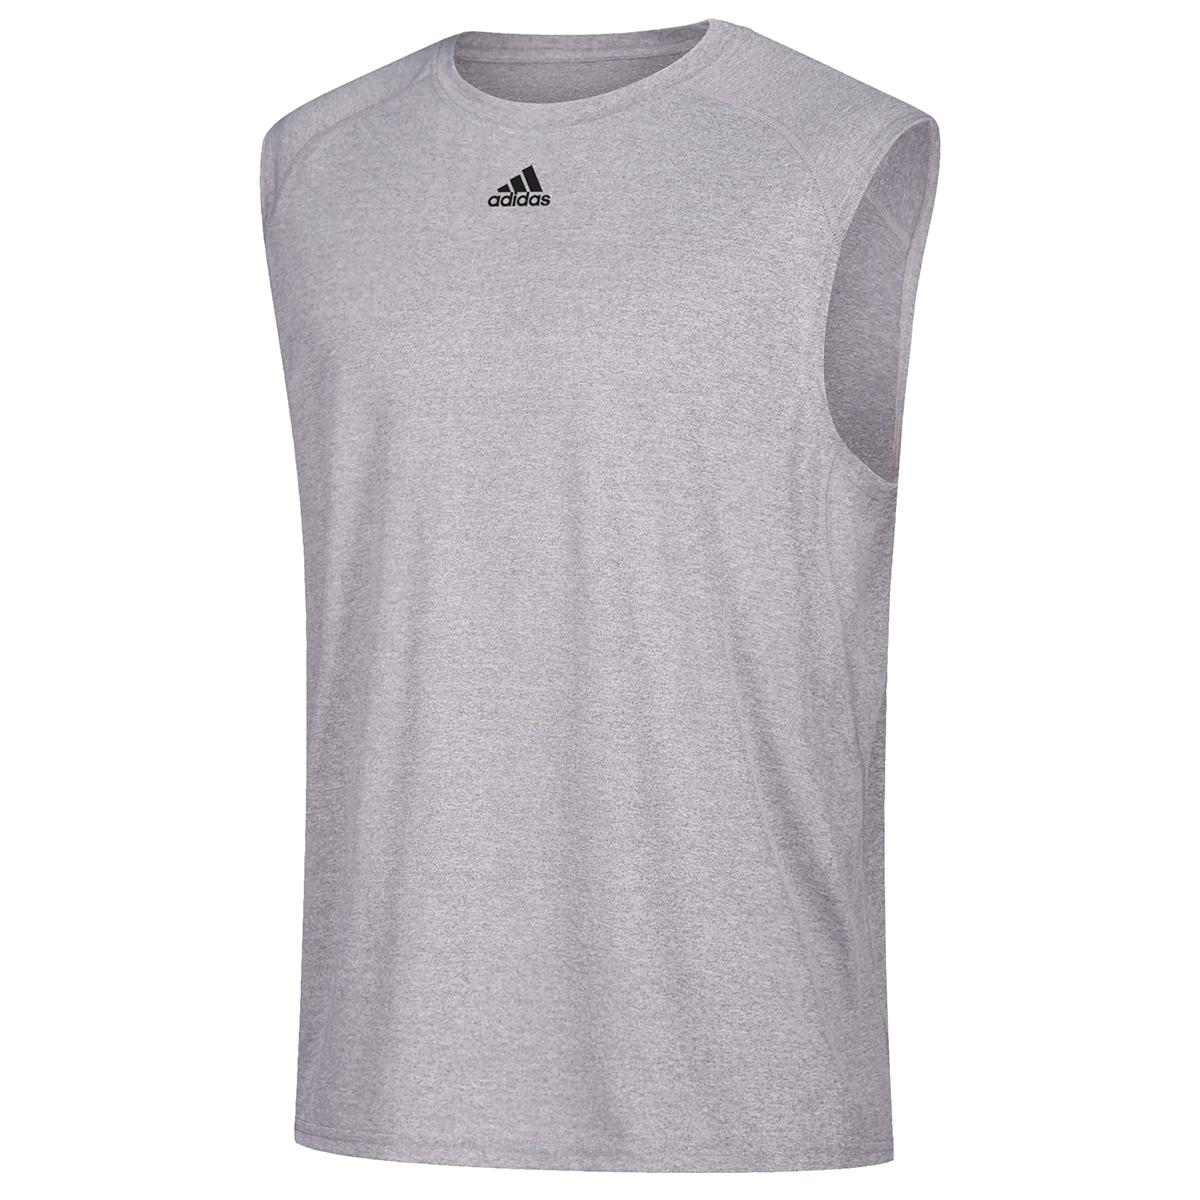 Adidas Men's Climalite Sleeveless Tee - Black, S